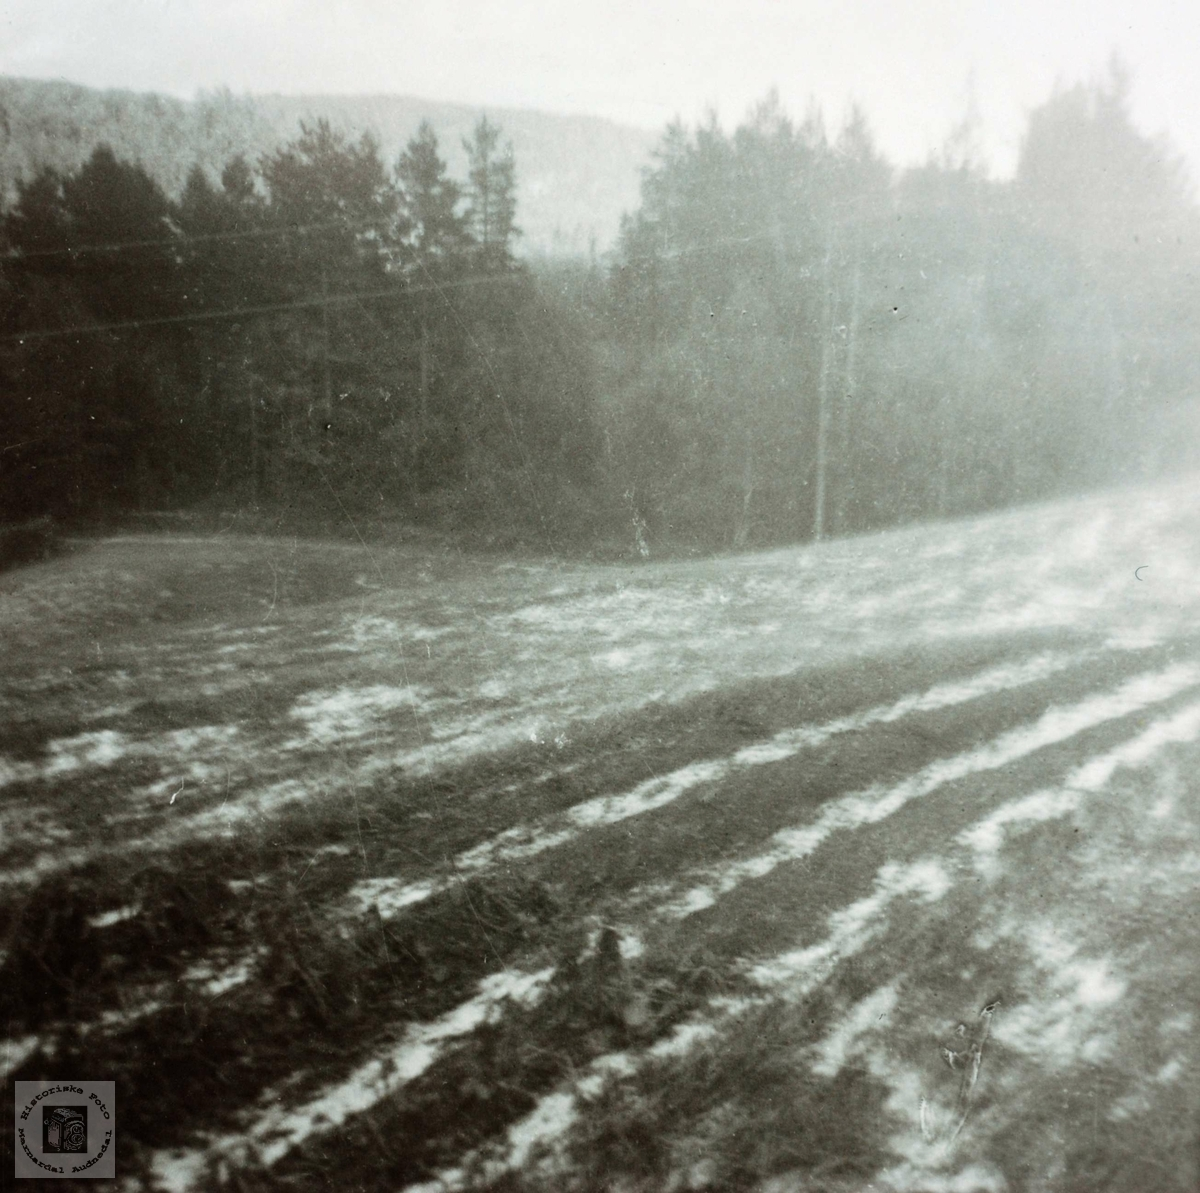 Potetriset har frosset etter en snøbyge i juli!